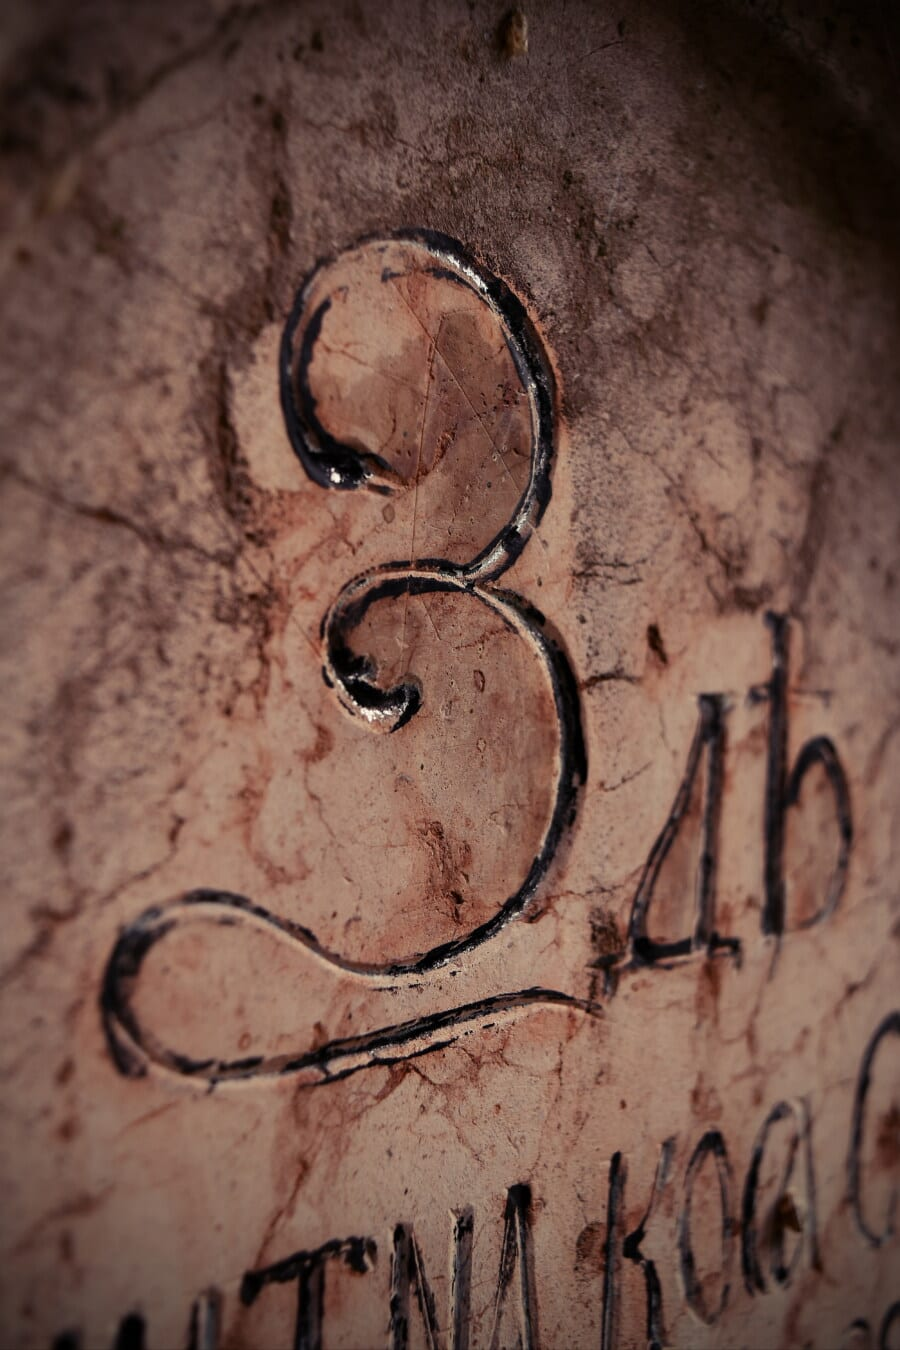 typografi, tekst, alfabetet, kyrillisk, historiske, gamle, symbolet, granitt, Graffiti, skitne